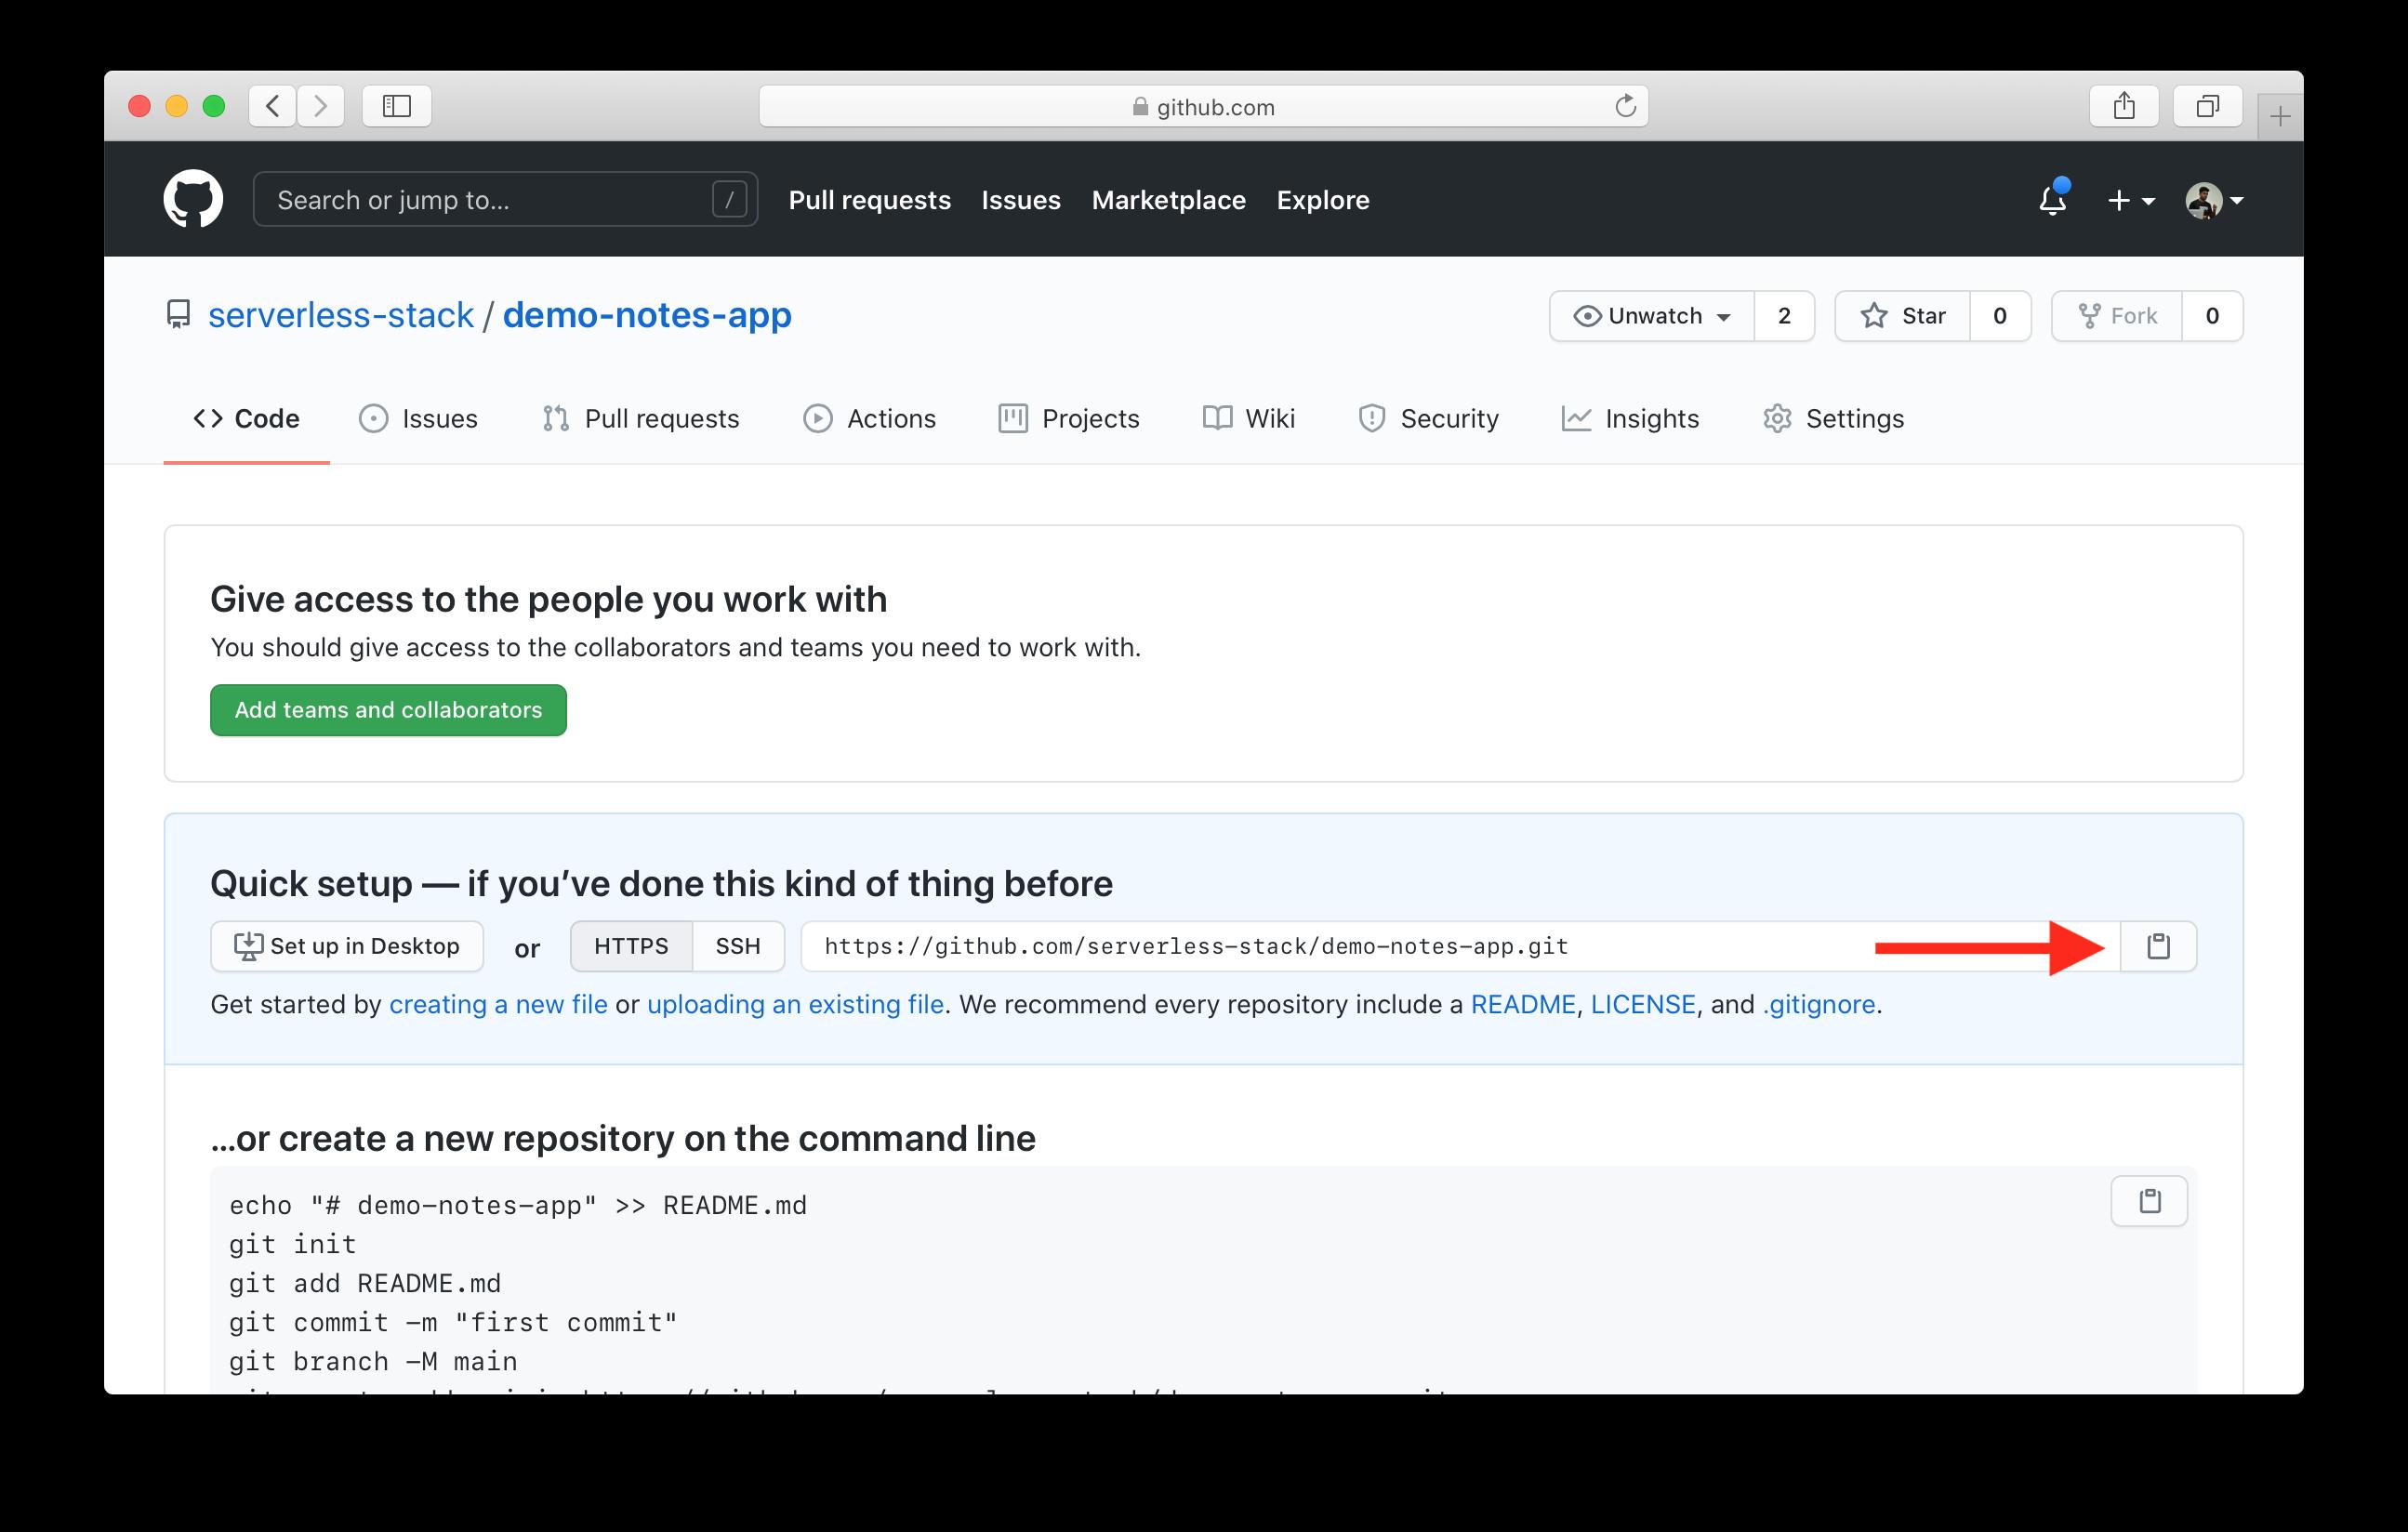 Captura de pantalla - Copiando la url del repositorio GitHub